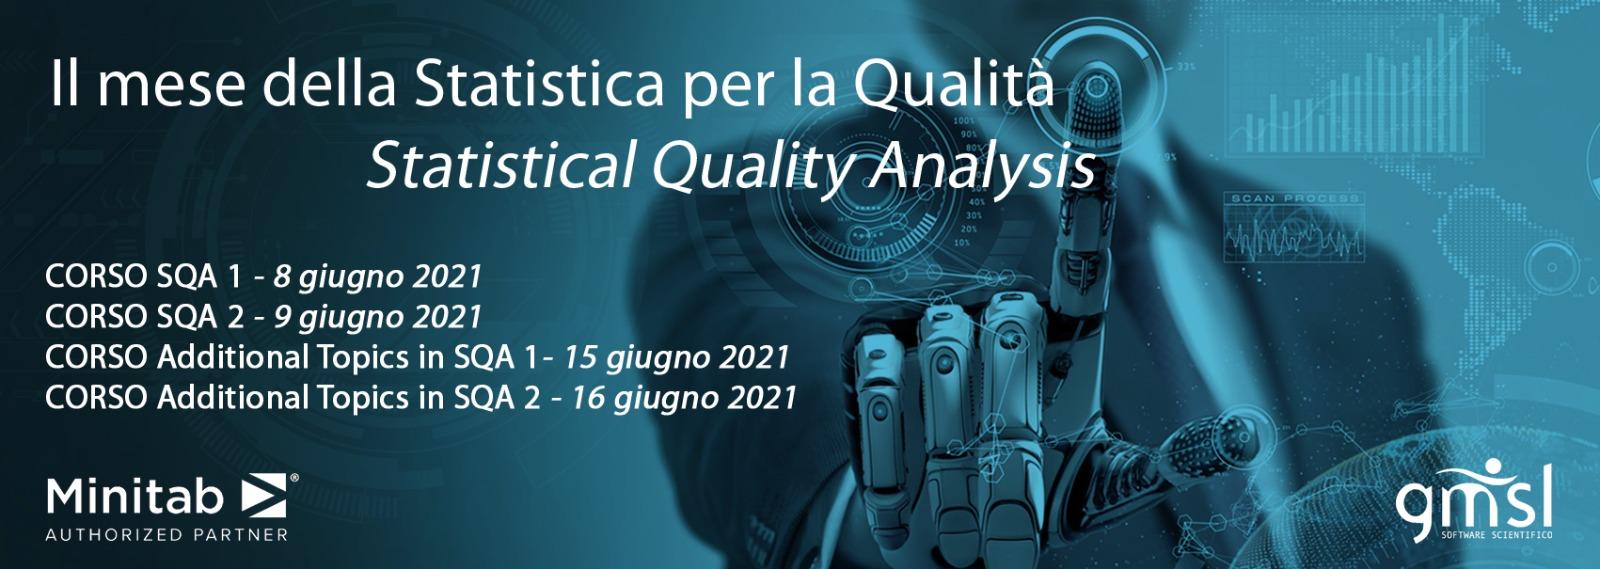 Mese-SQA Minitab | CORSI MINITAB - Il mese della Statistica per la Qualità (Statistical Quality Analysis)